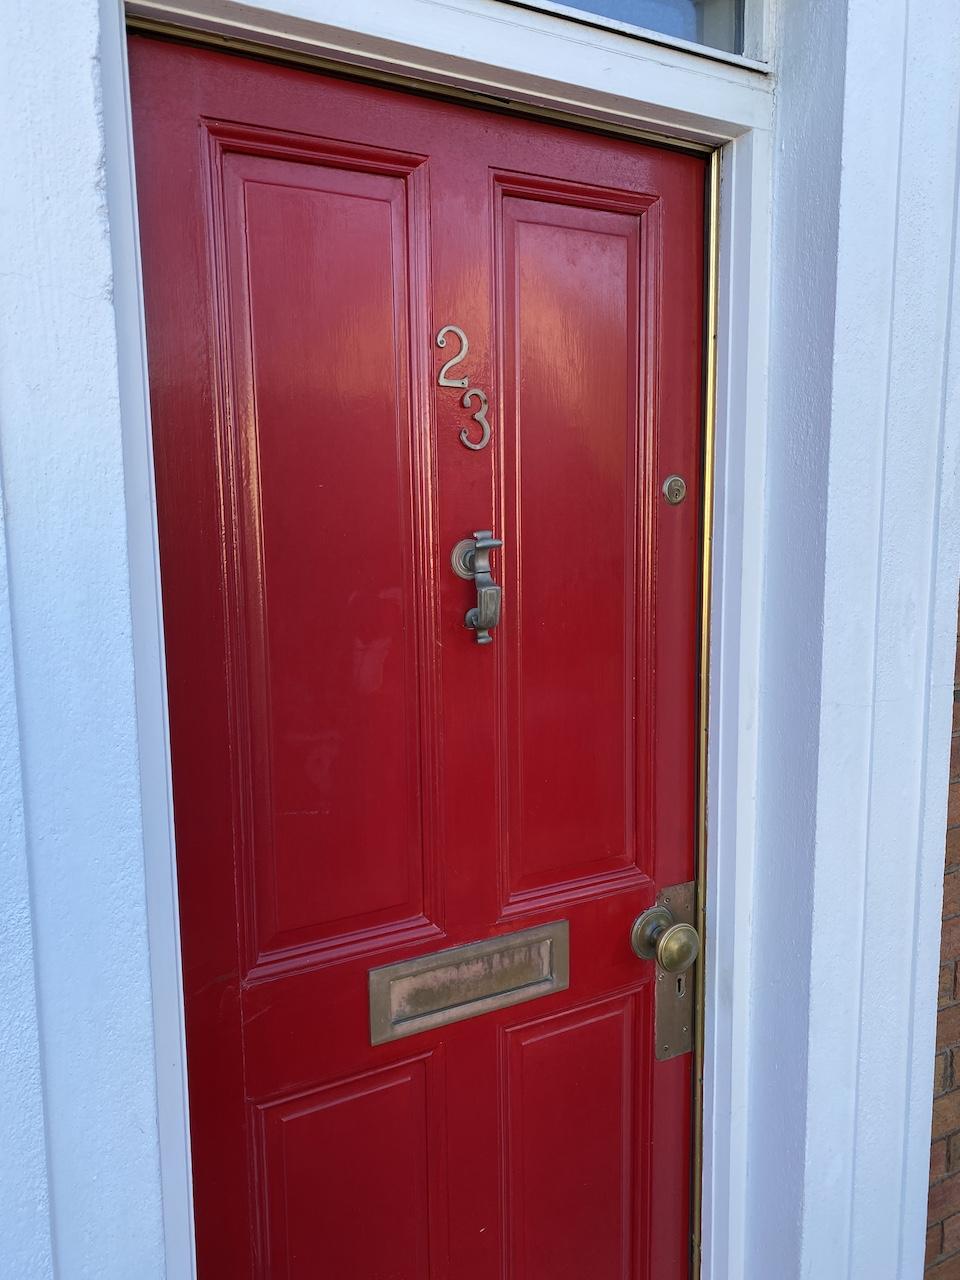 FOR SALE Own Door Office – 23 Priory Office Park, Stillorgan Rd, Blackrock, Co. Dublin